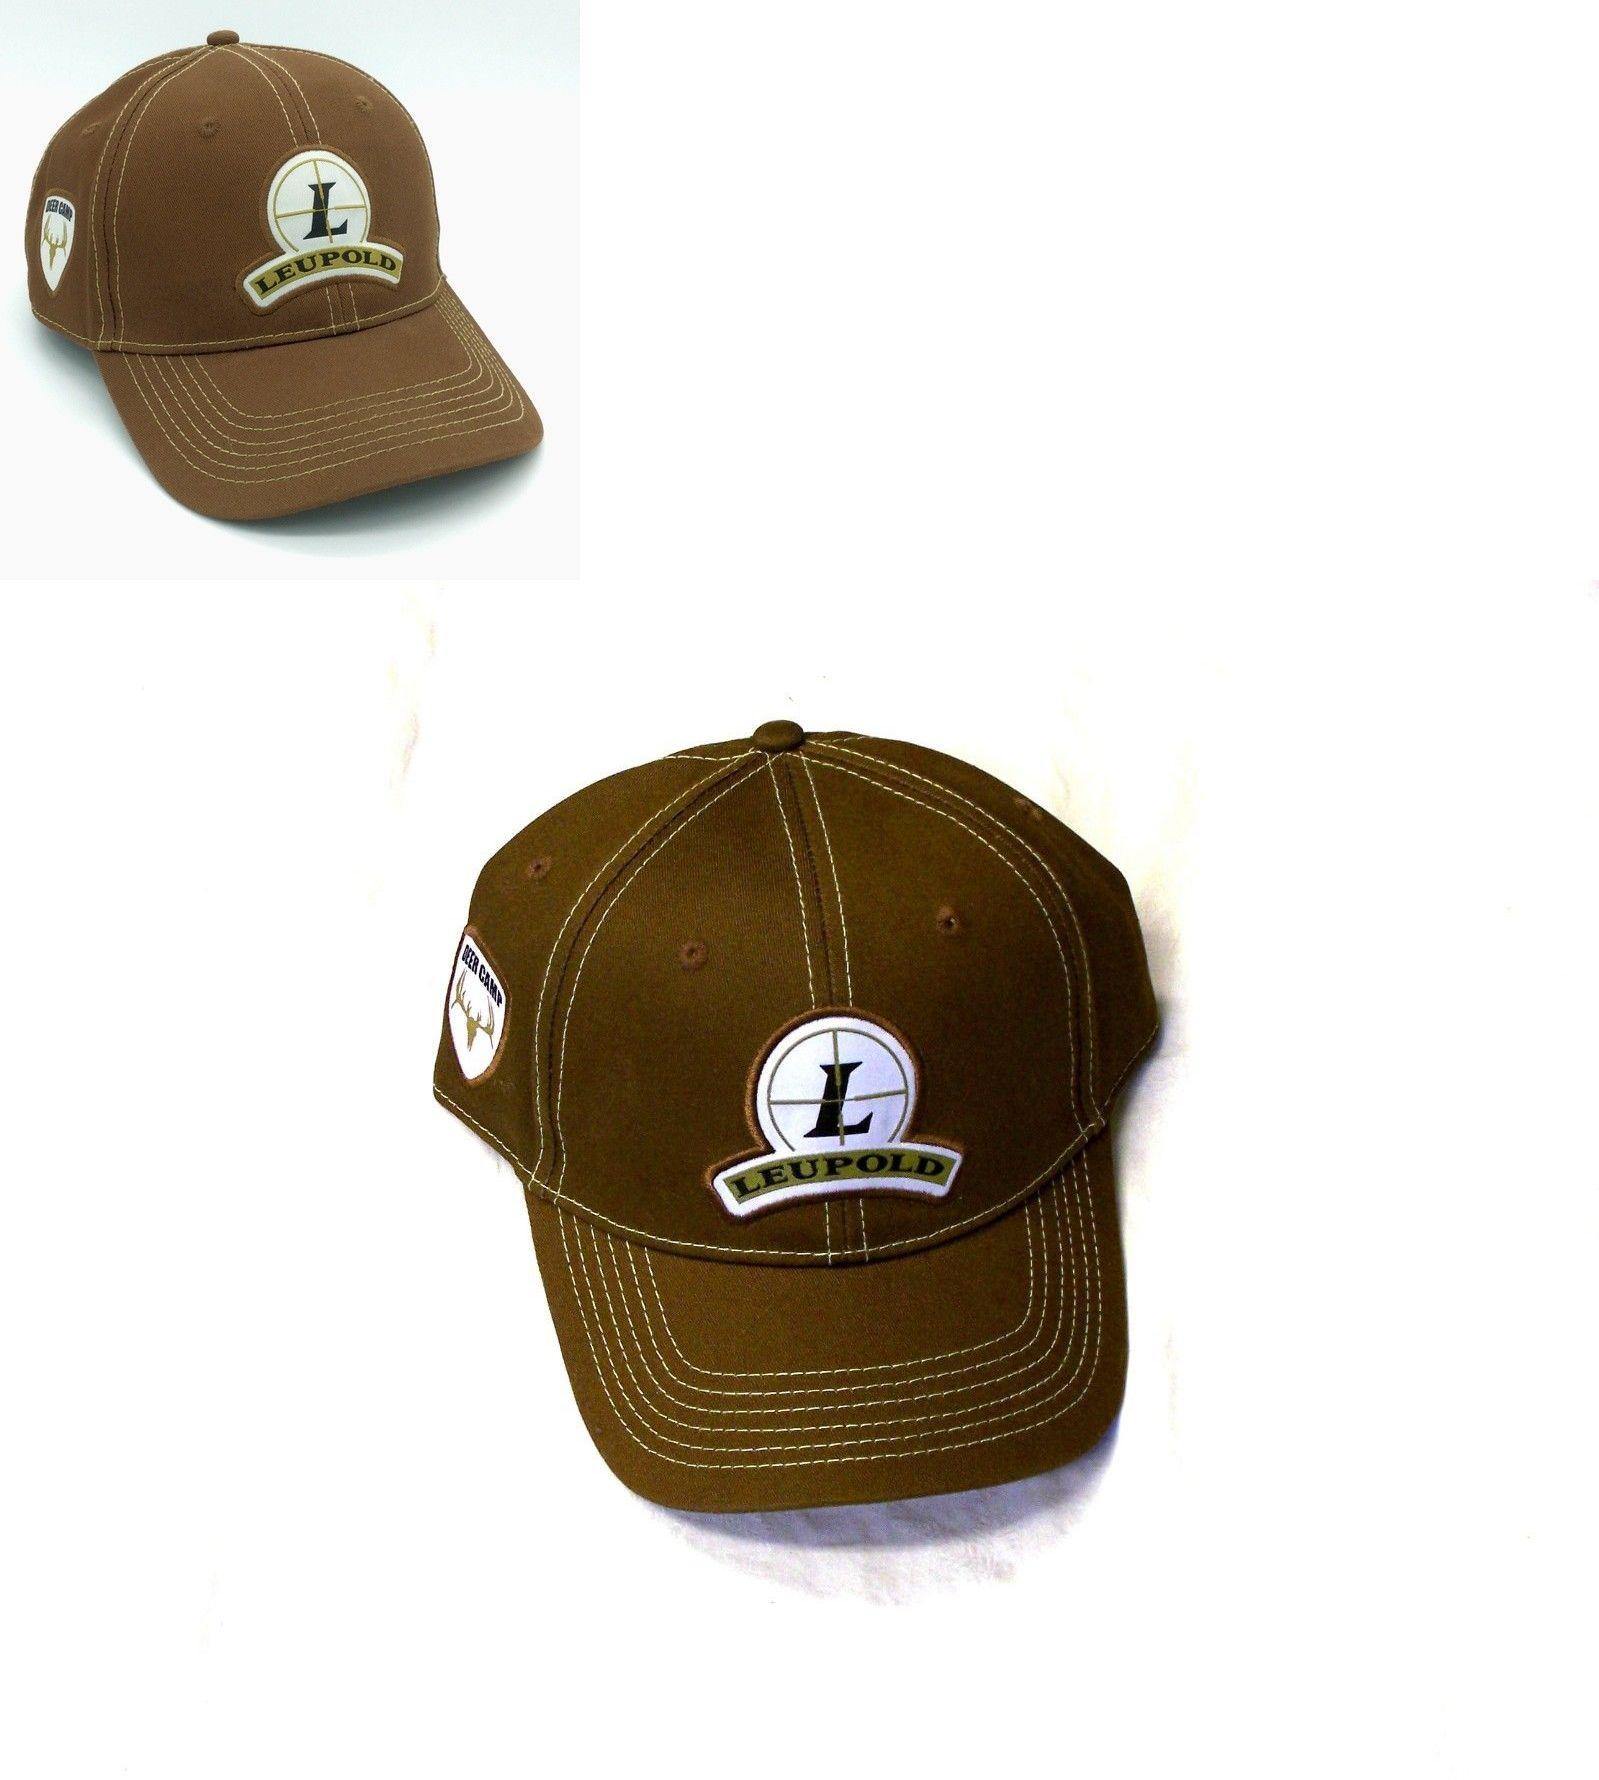 5d076d7b146 Hats 163543  Leupold Deer Camp Est 1907 Brown Strap Back Baseball Dad Cap  Hat Rifle